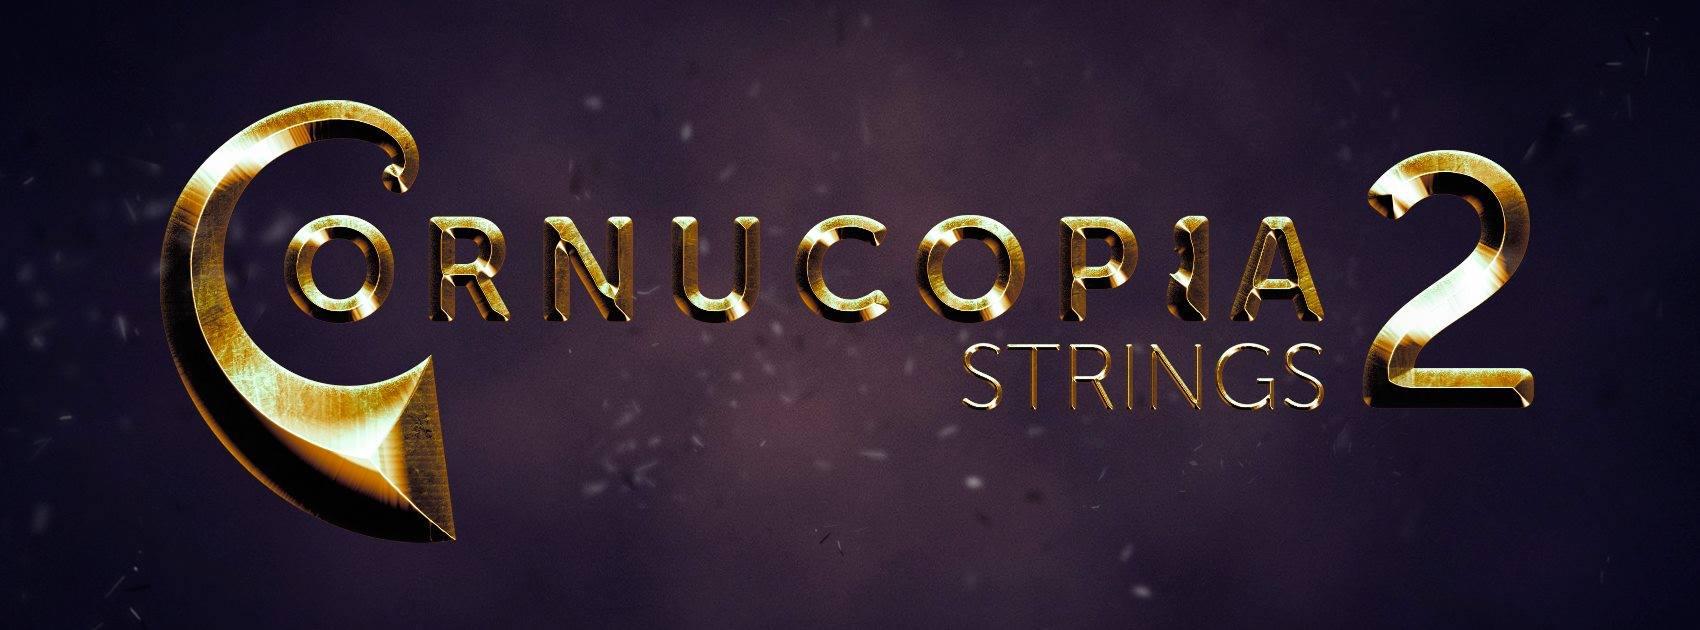 CORNUCOPIA STRINGS 2